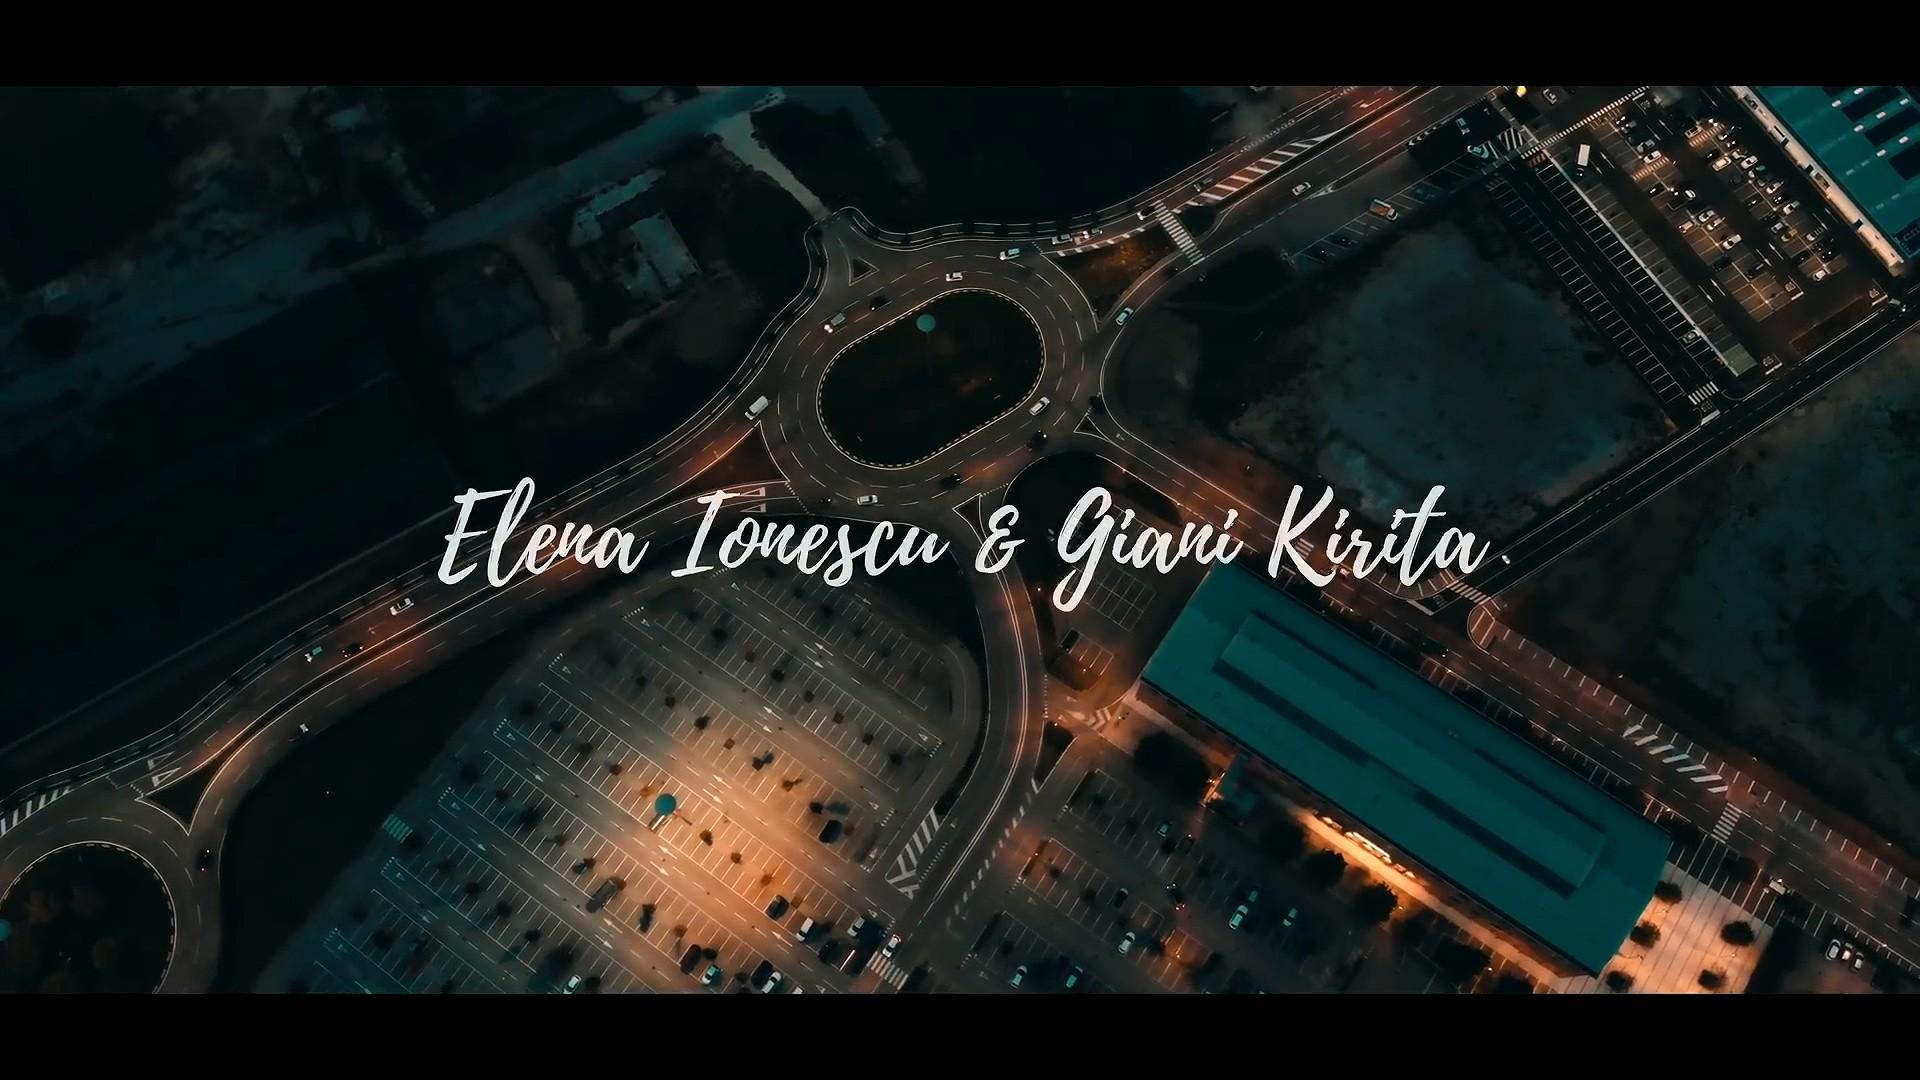 Elena IonElena Ionescu x Giani Kirita - Bate Inima - Versuriescu x Giani Kirita - Bate Inima - Versuri